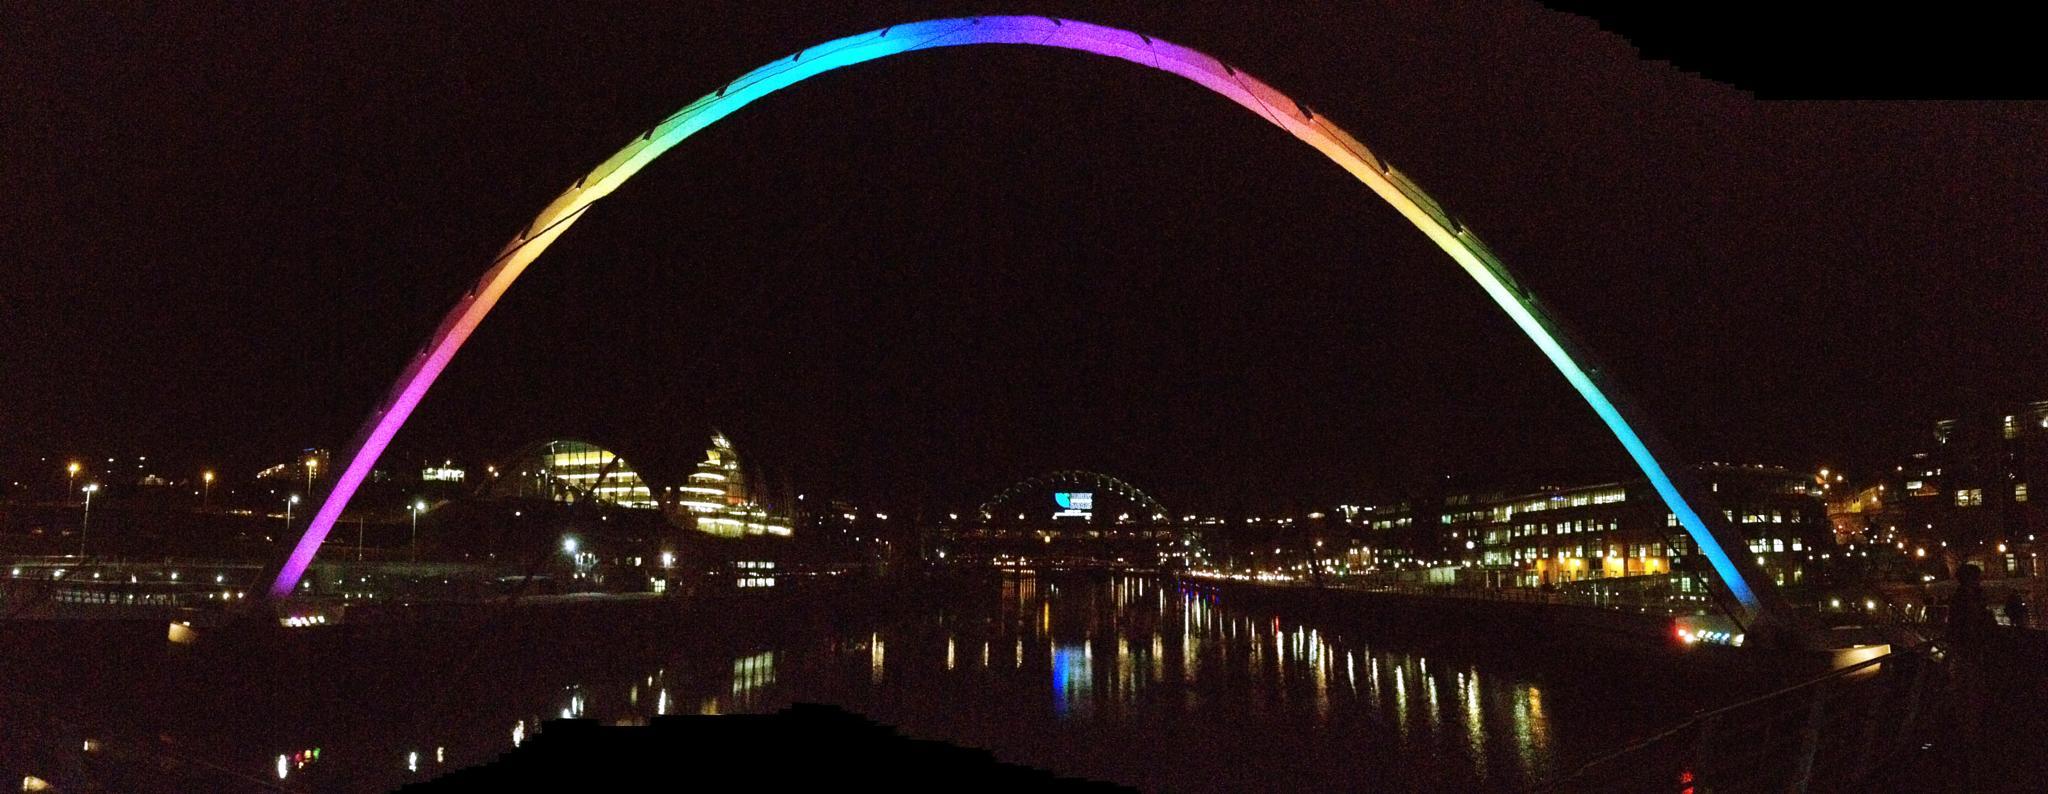 River Tyne at night by Paul Stobbs